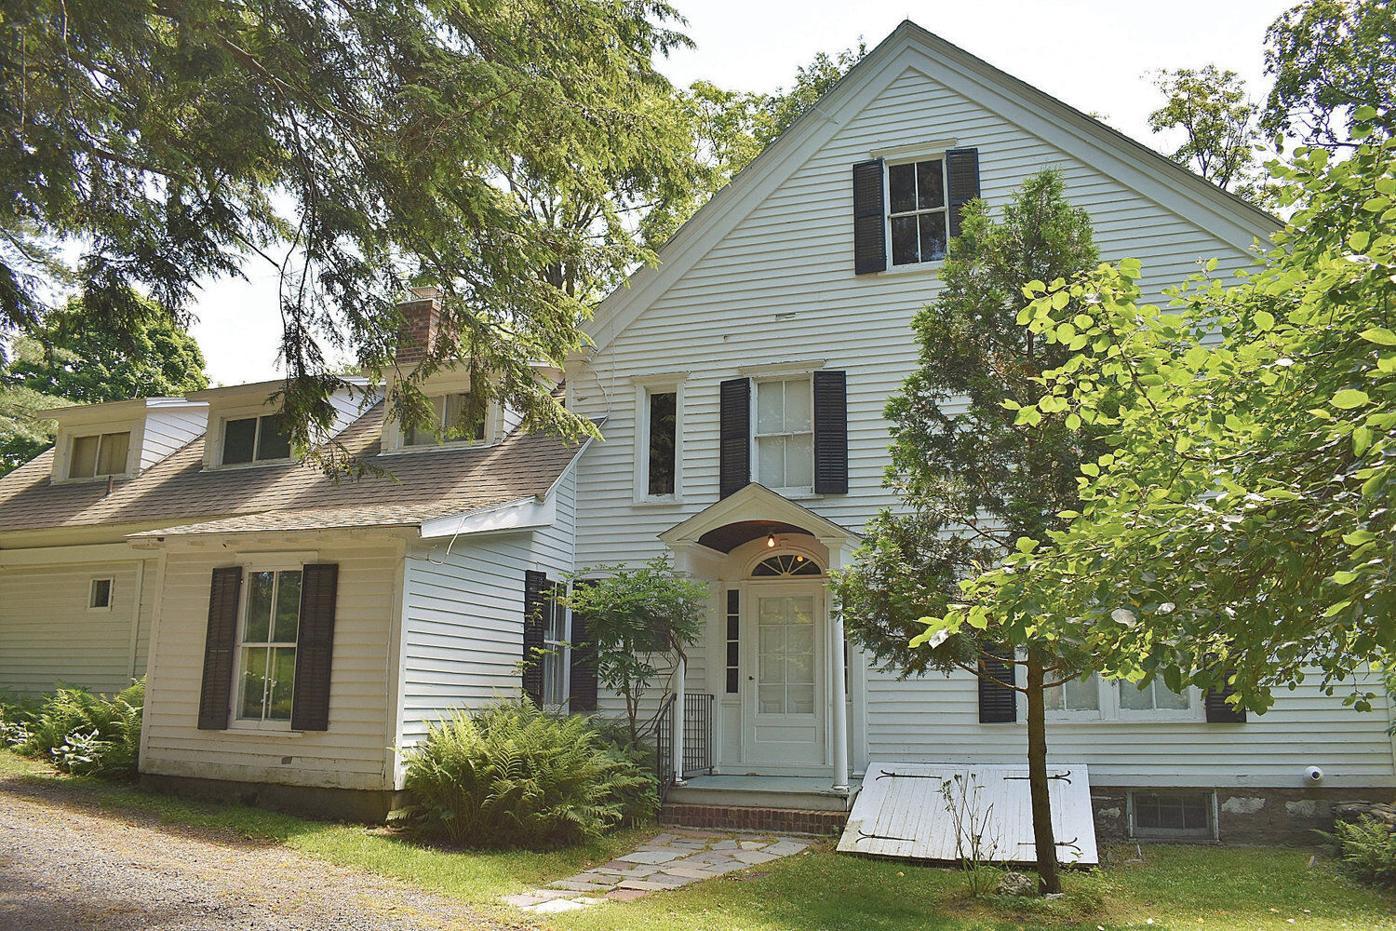 The Edna St. Vincent Millay Society: Saving Steepletop